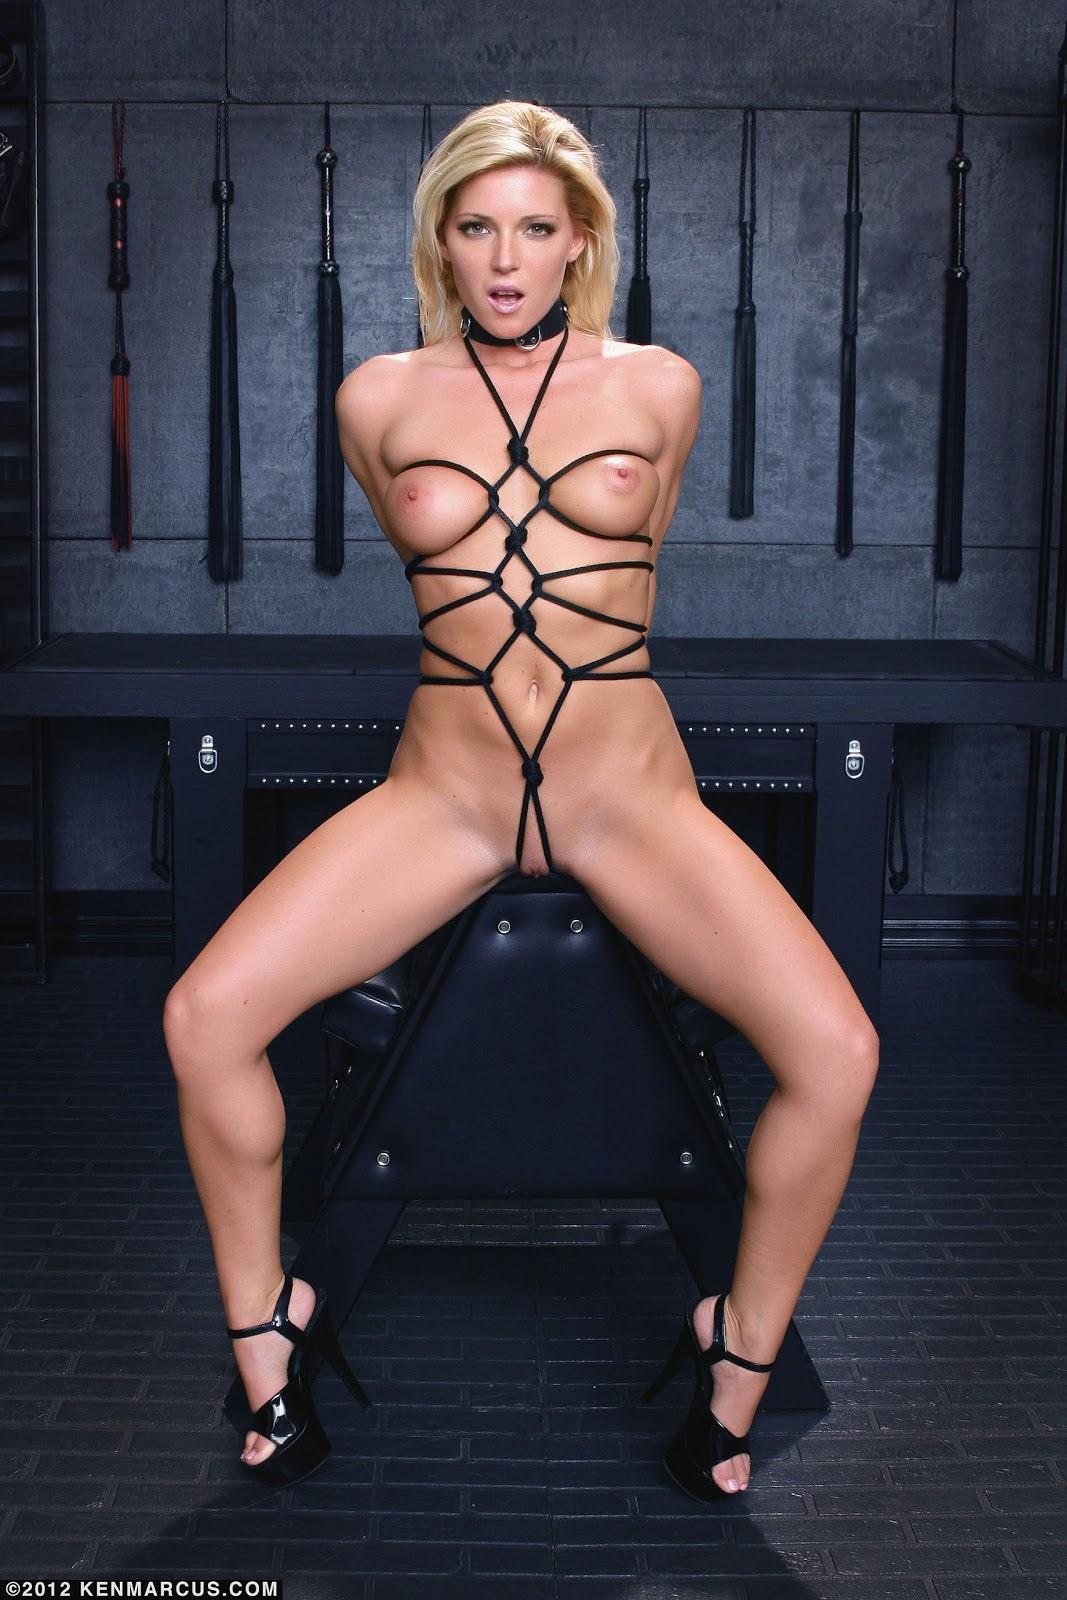 Niki Lee